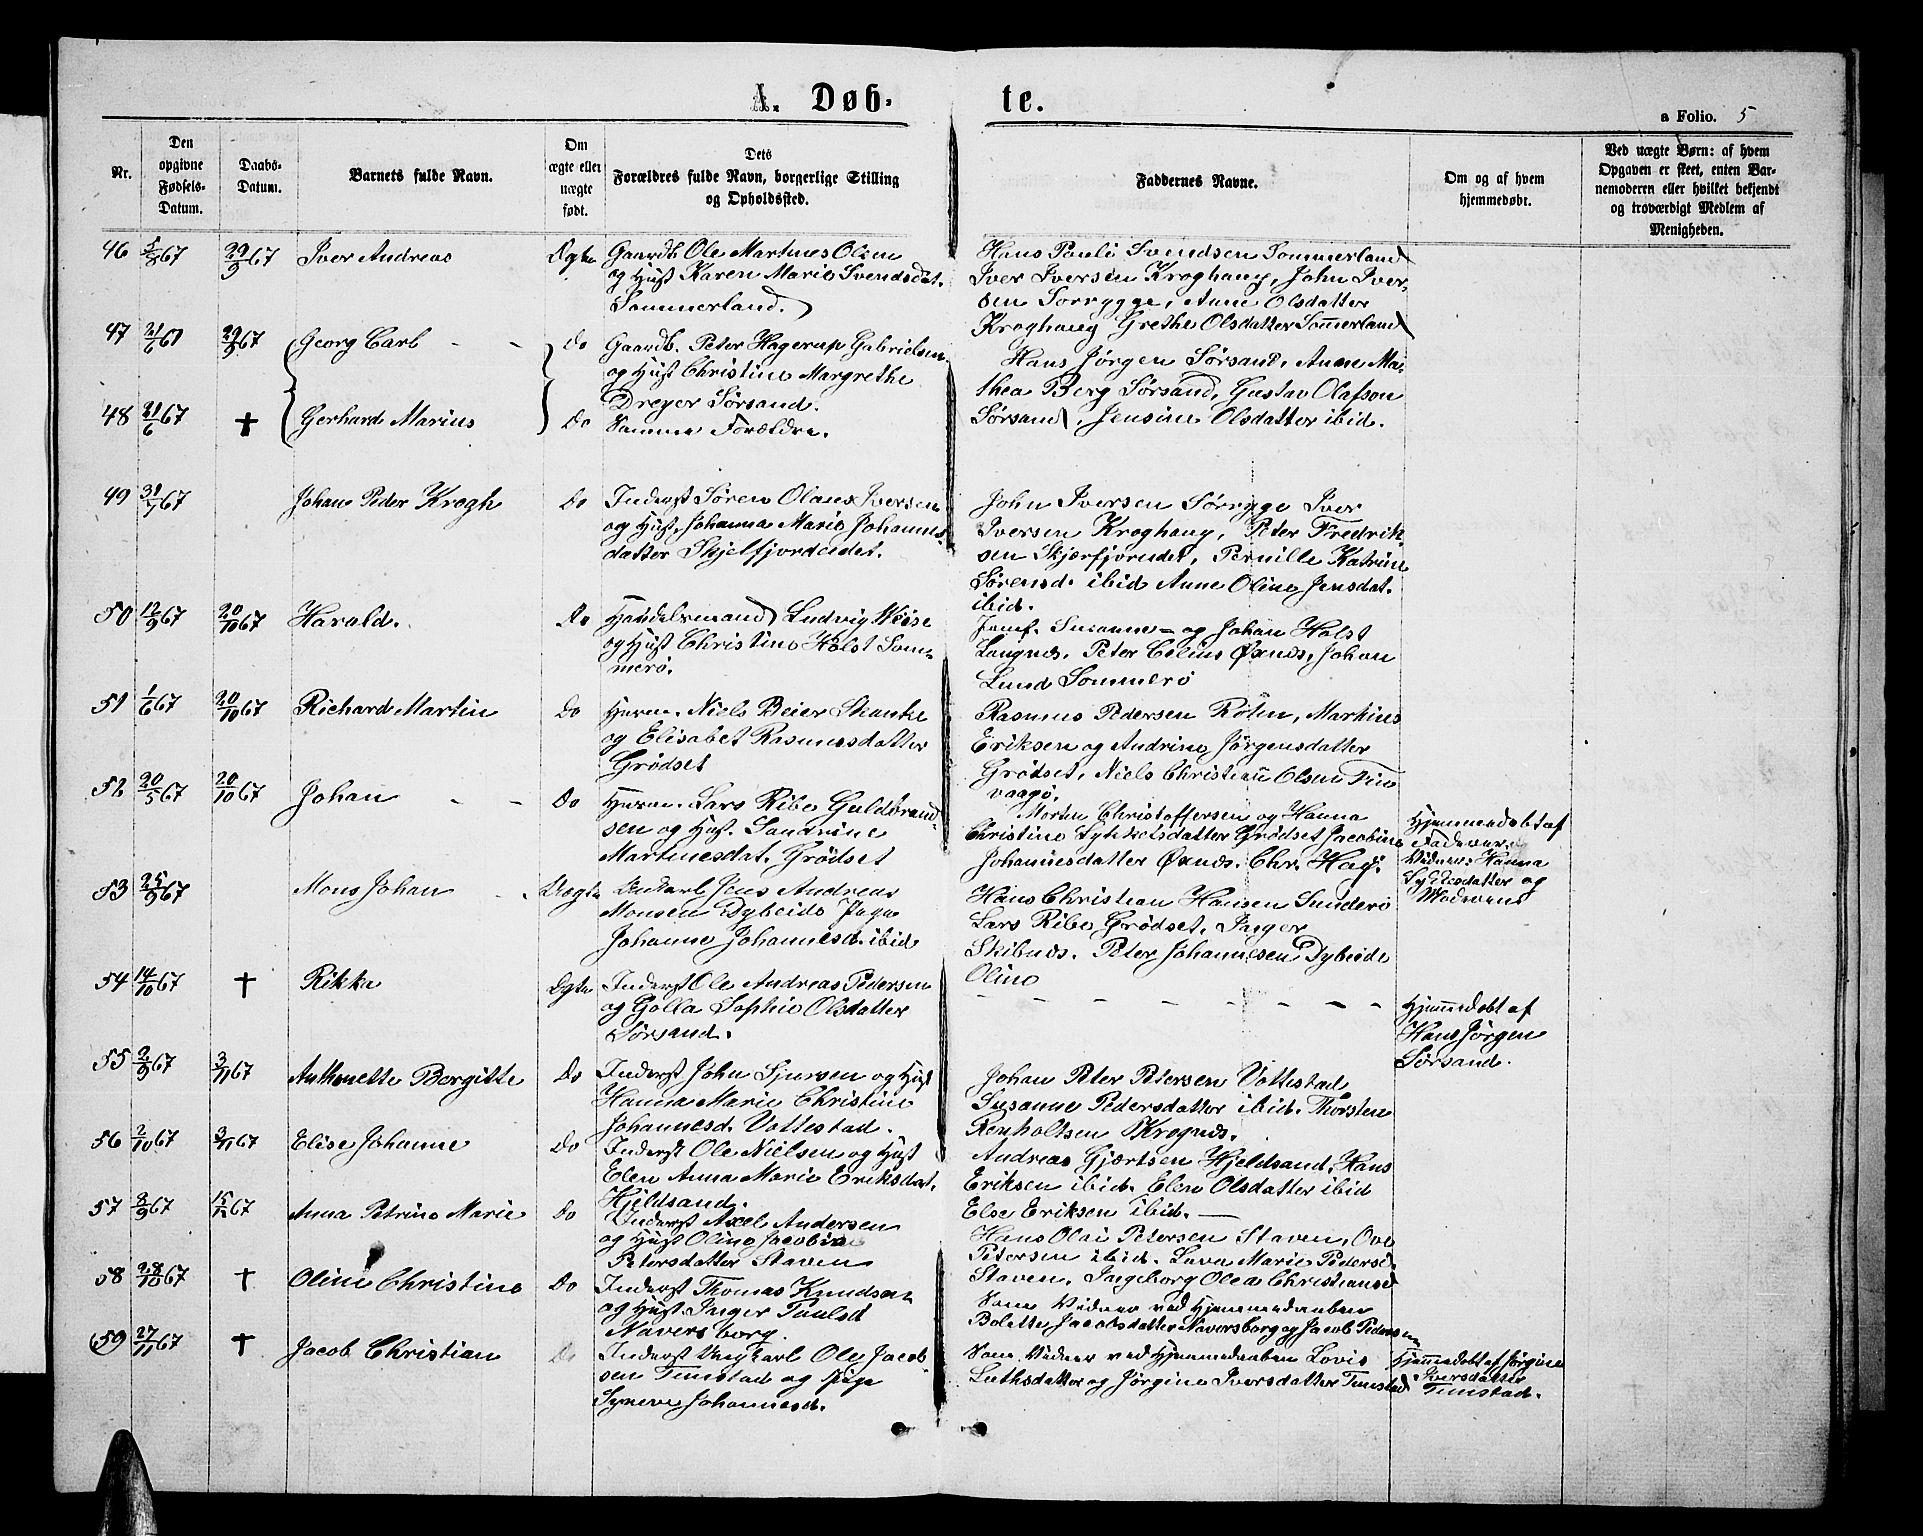 SAT, Ministerialprotokoller, klokkerbøker og fødselsregistre - Nordland, 893/L1348: Klokkerbok nr. 893C03, 1867-1877, s. 5